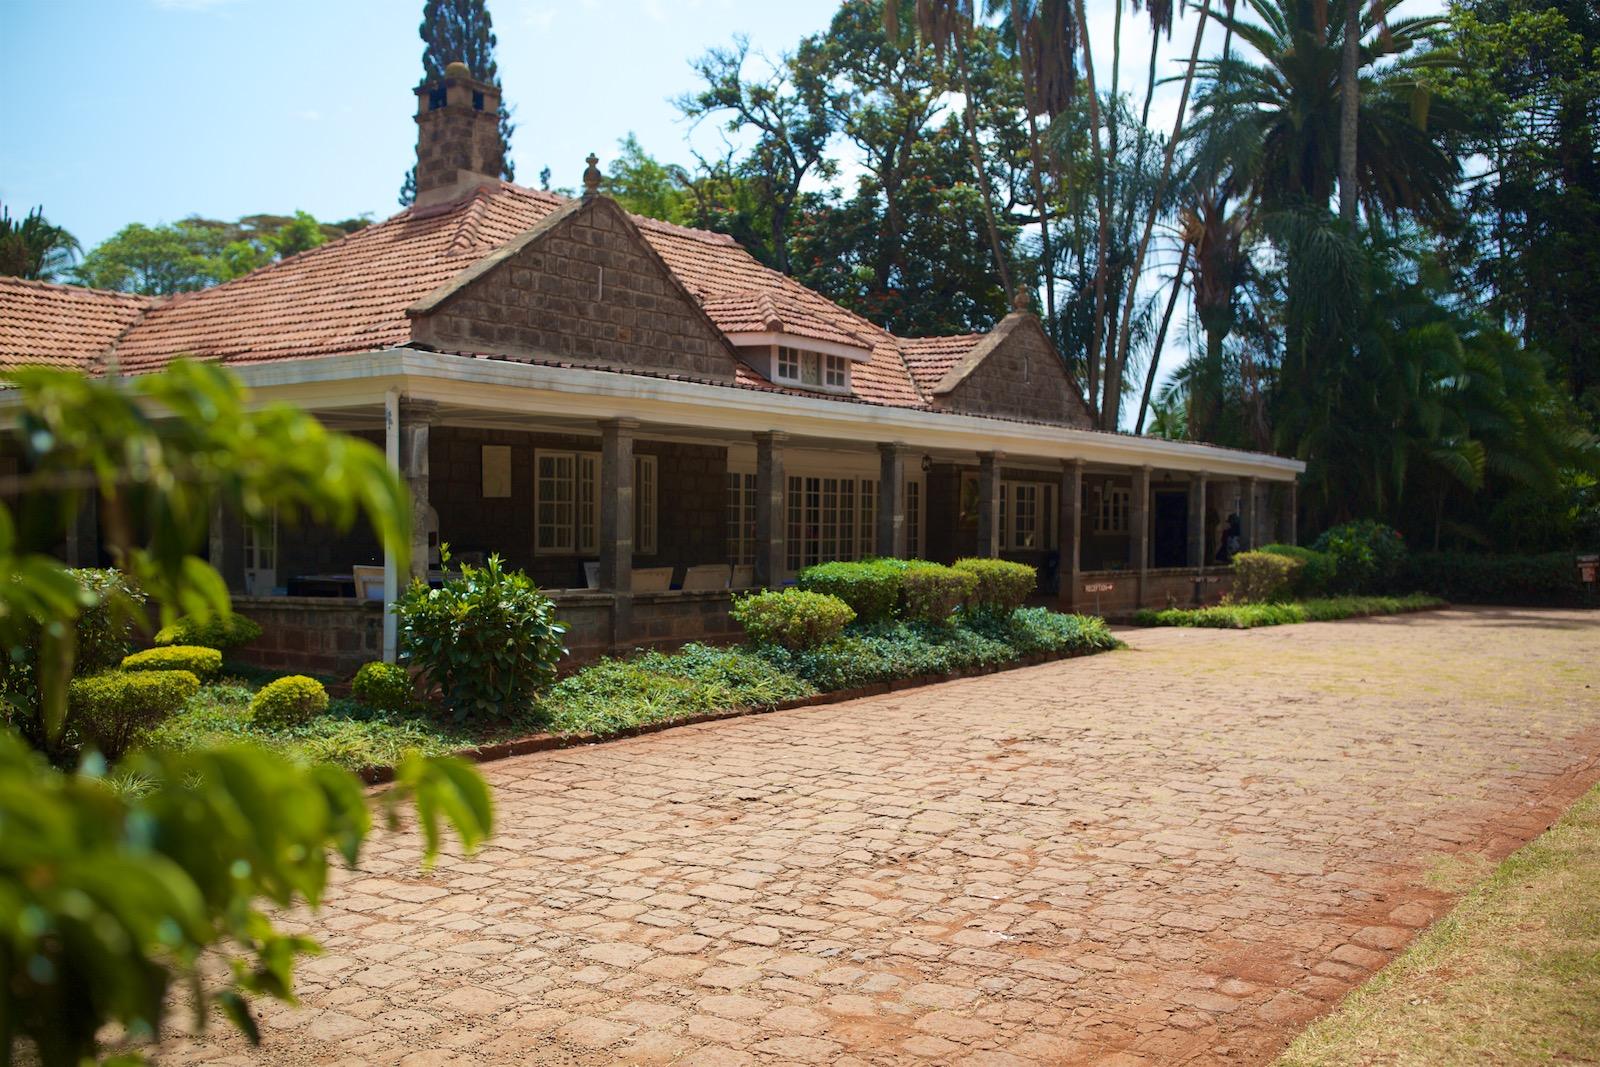 Karen Blixens farm i Nairobi